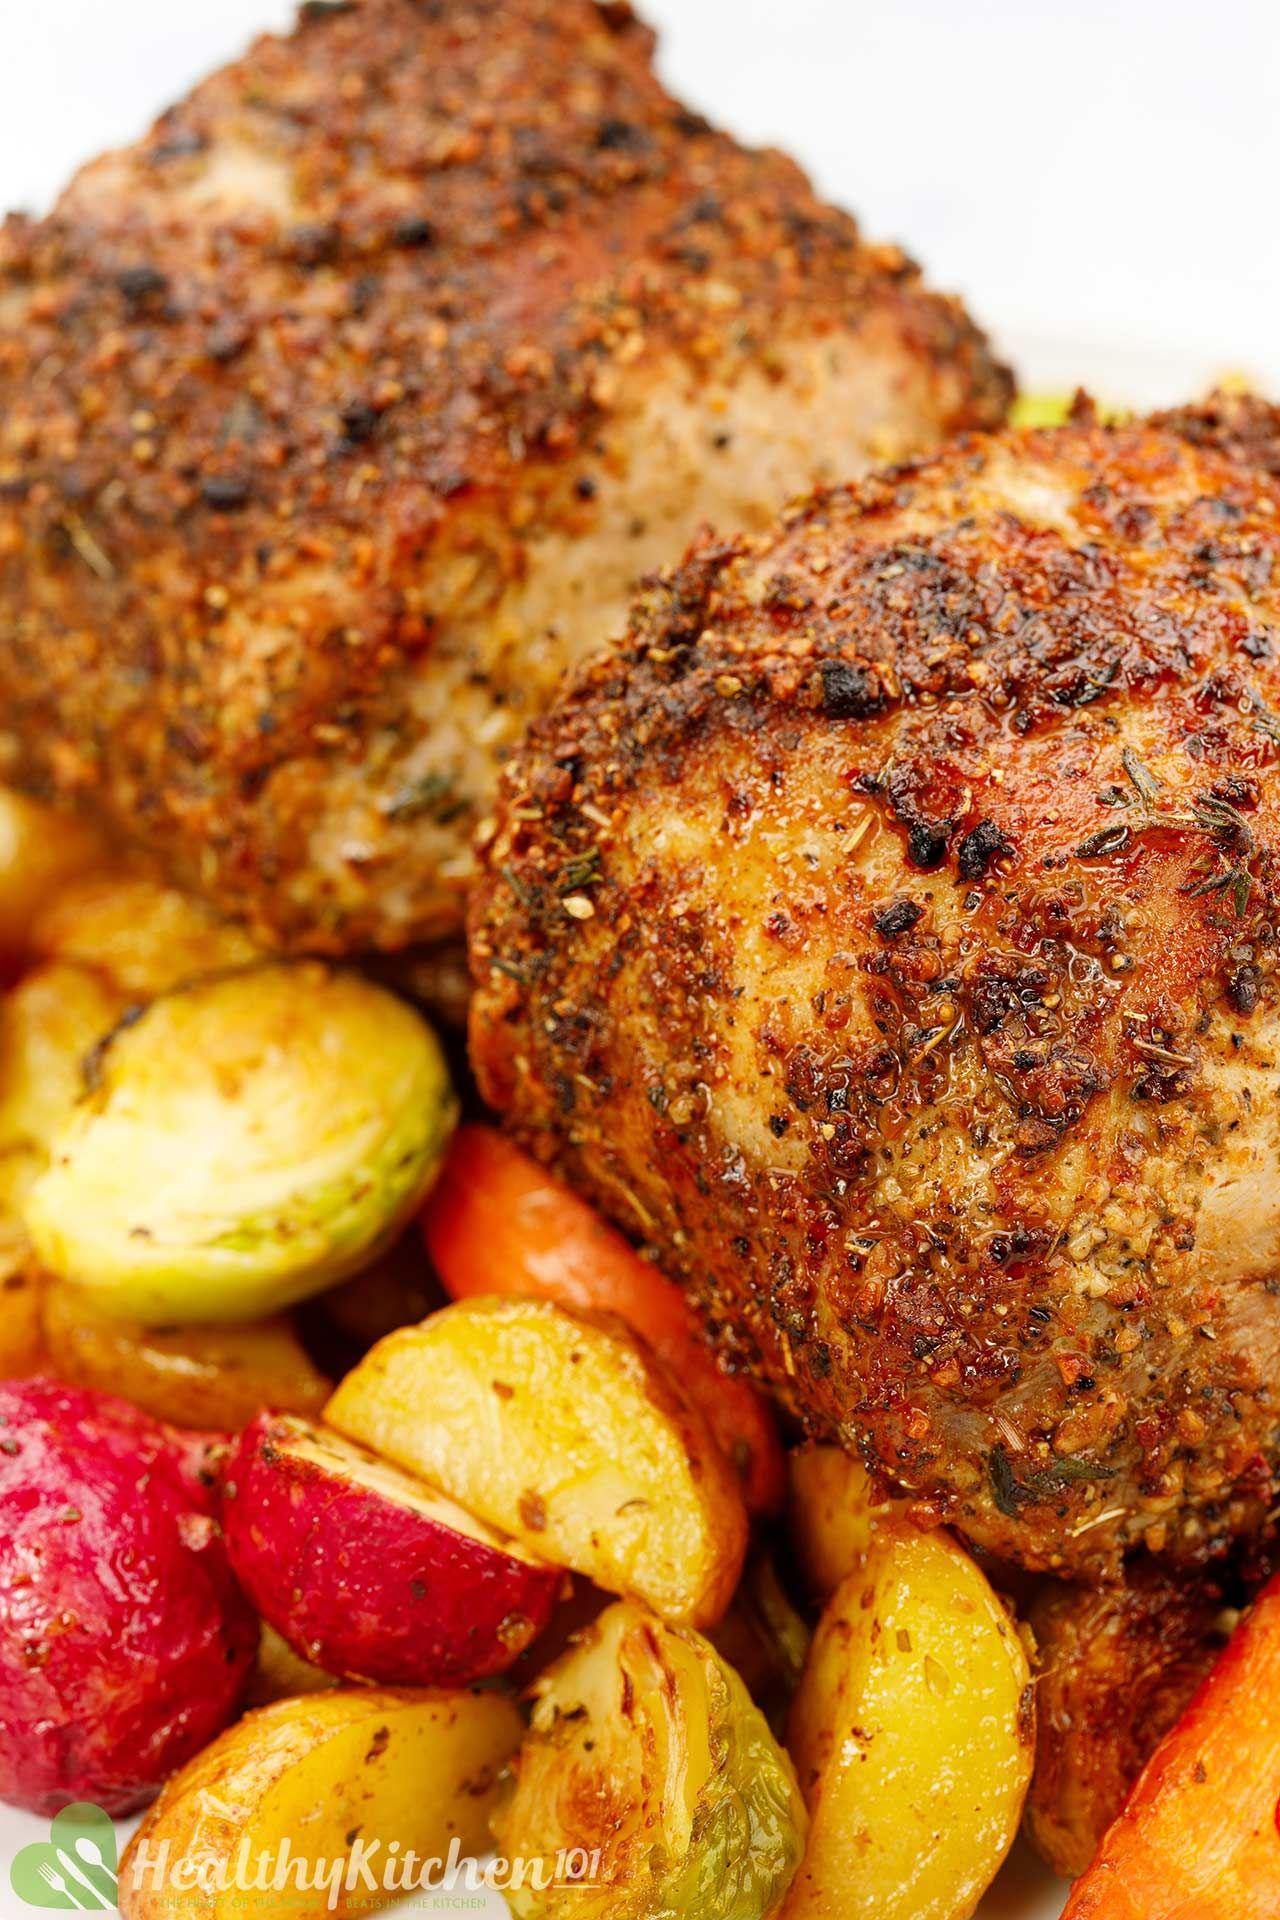 Homemade Air Fryer Pork Loin Recipe